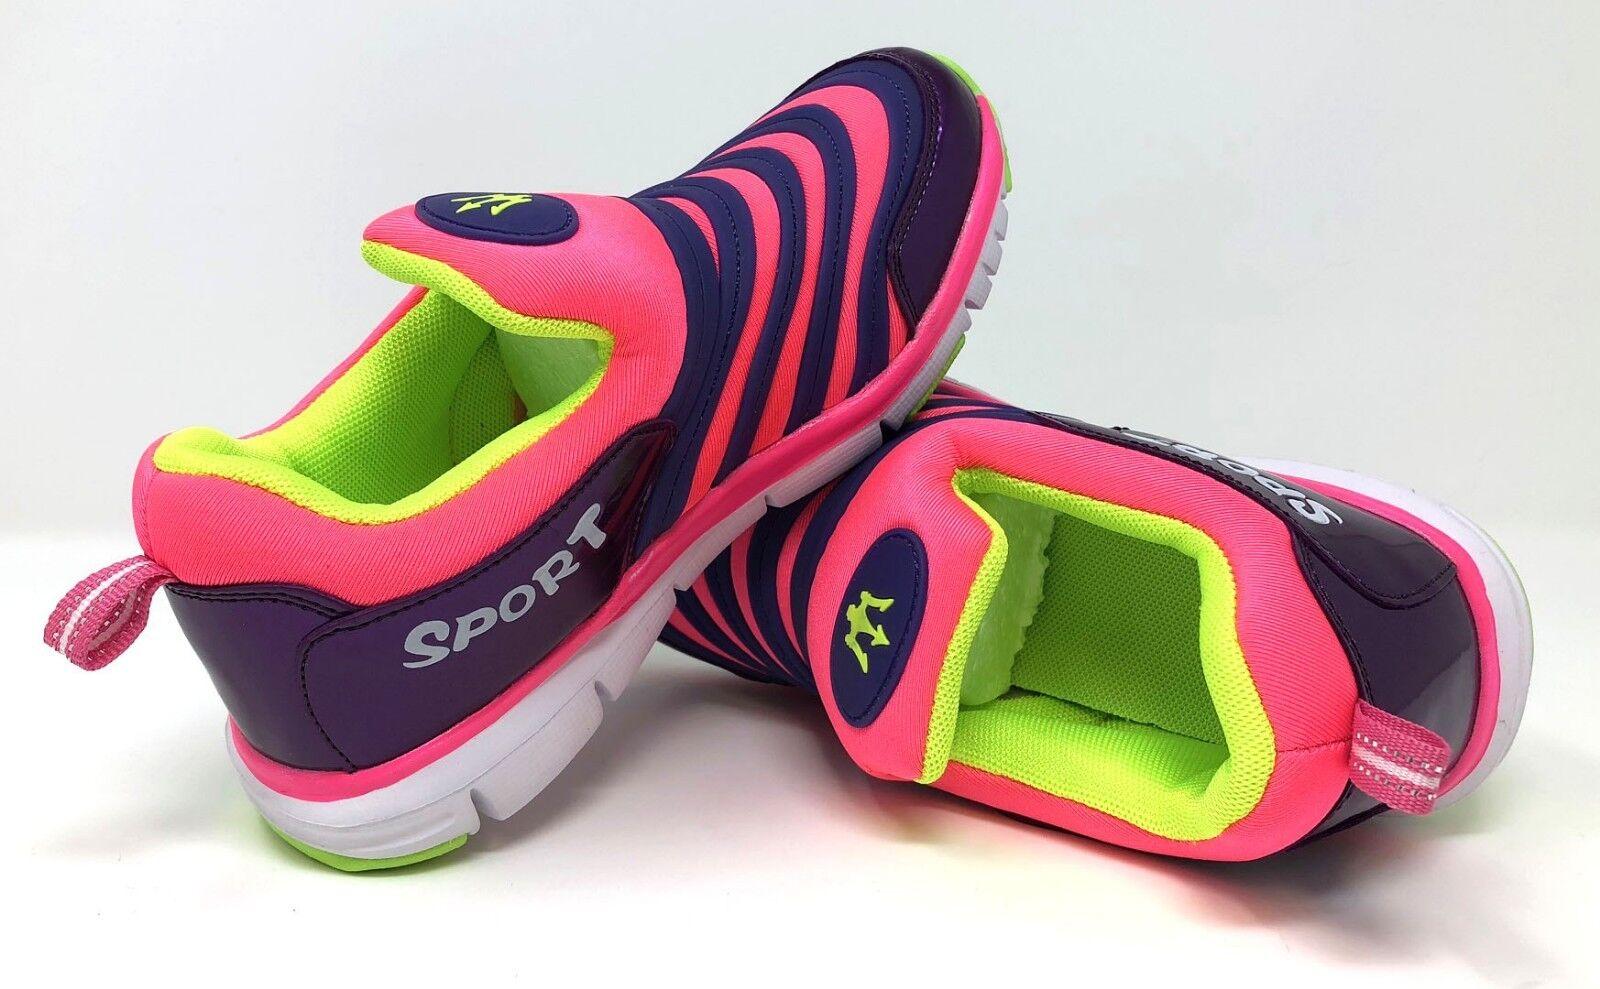 Bambine Ragazze Abbigliamento Sportivo Scarpe da Ginnastica Slip Comodo UK